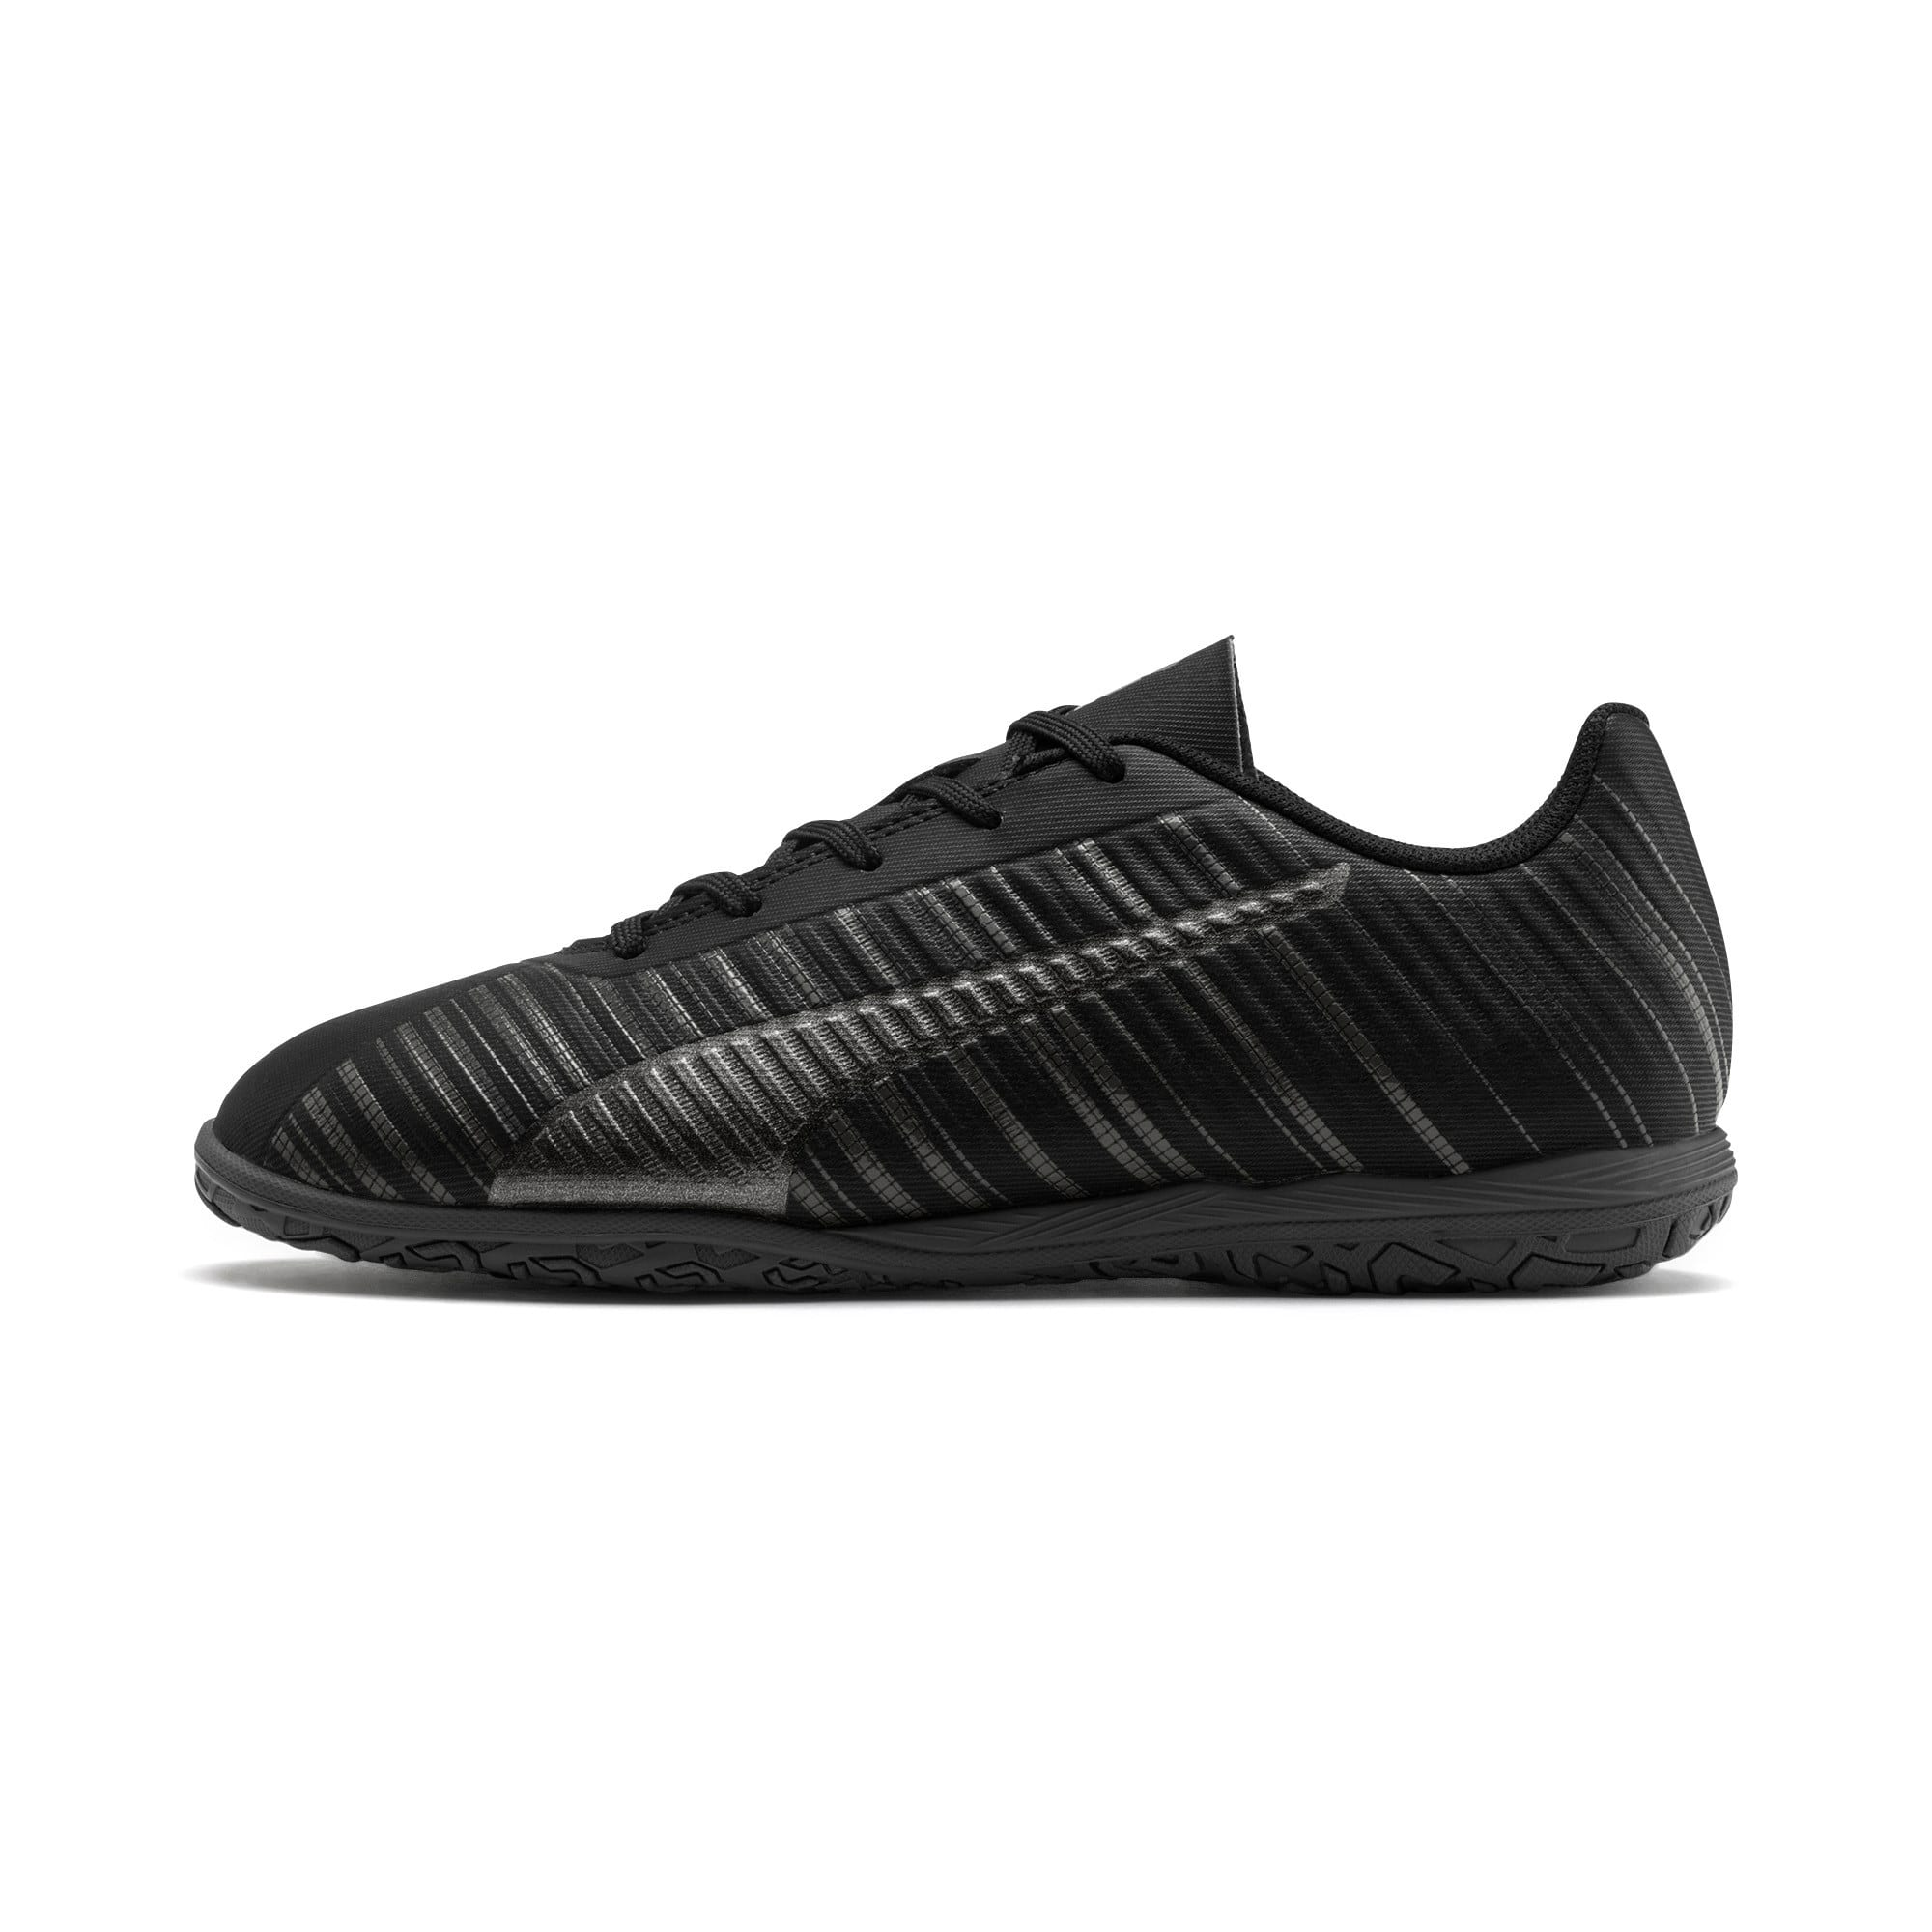 Thumbnail 1 of PUMA ONE 5.4 IT Soccer Shoes JR, Black-Black-Puma Aged Silver, medium